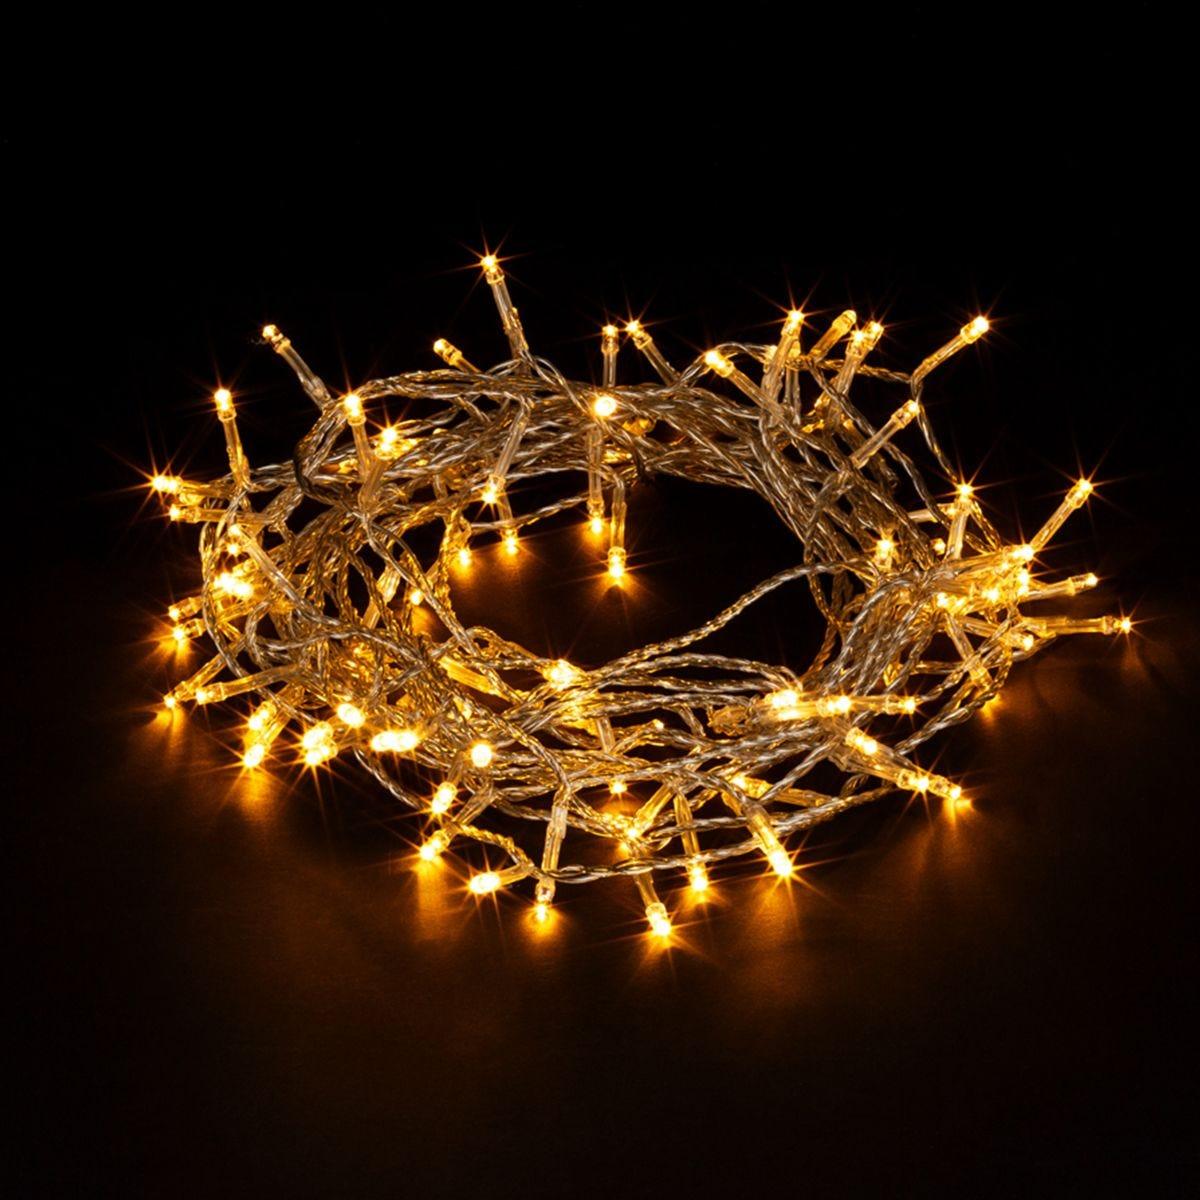 Robert Dyas 400 Translucent String Lights - Warm White